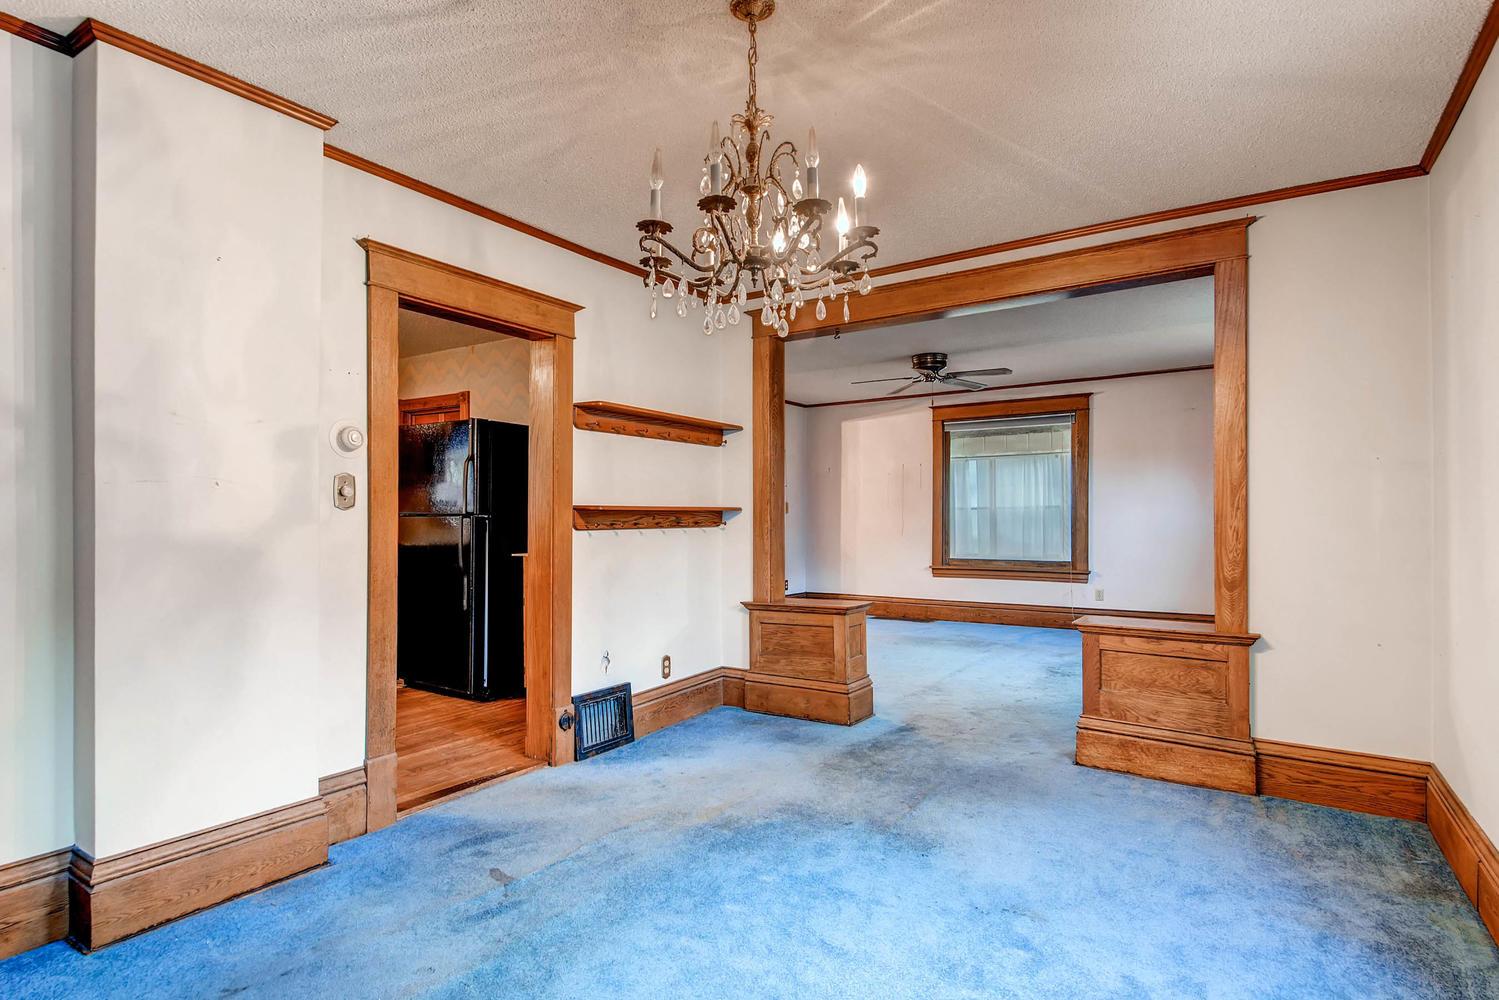 630 5th St NE Minneapolis MN-large-009-1-Dining Room-1500x1000-72dpi.jpg